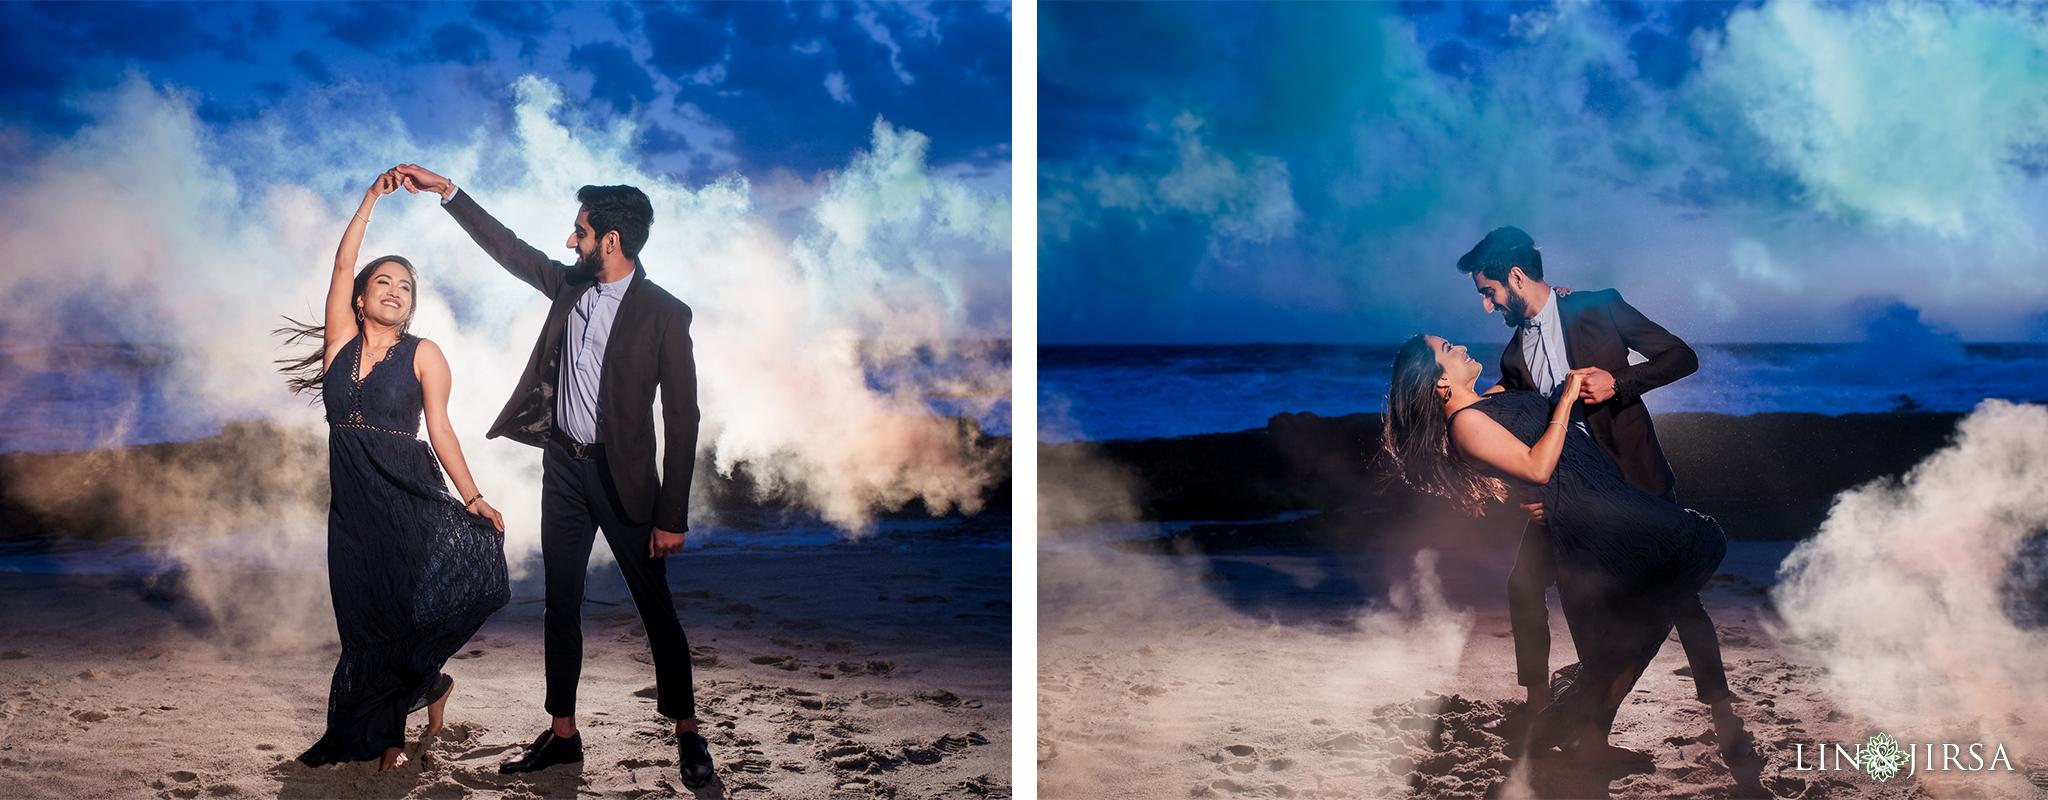 11 Victoria Beach Smoke Engagement Photography